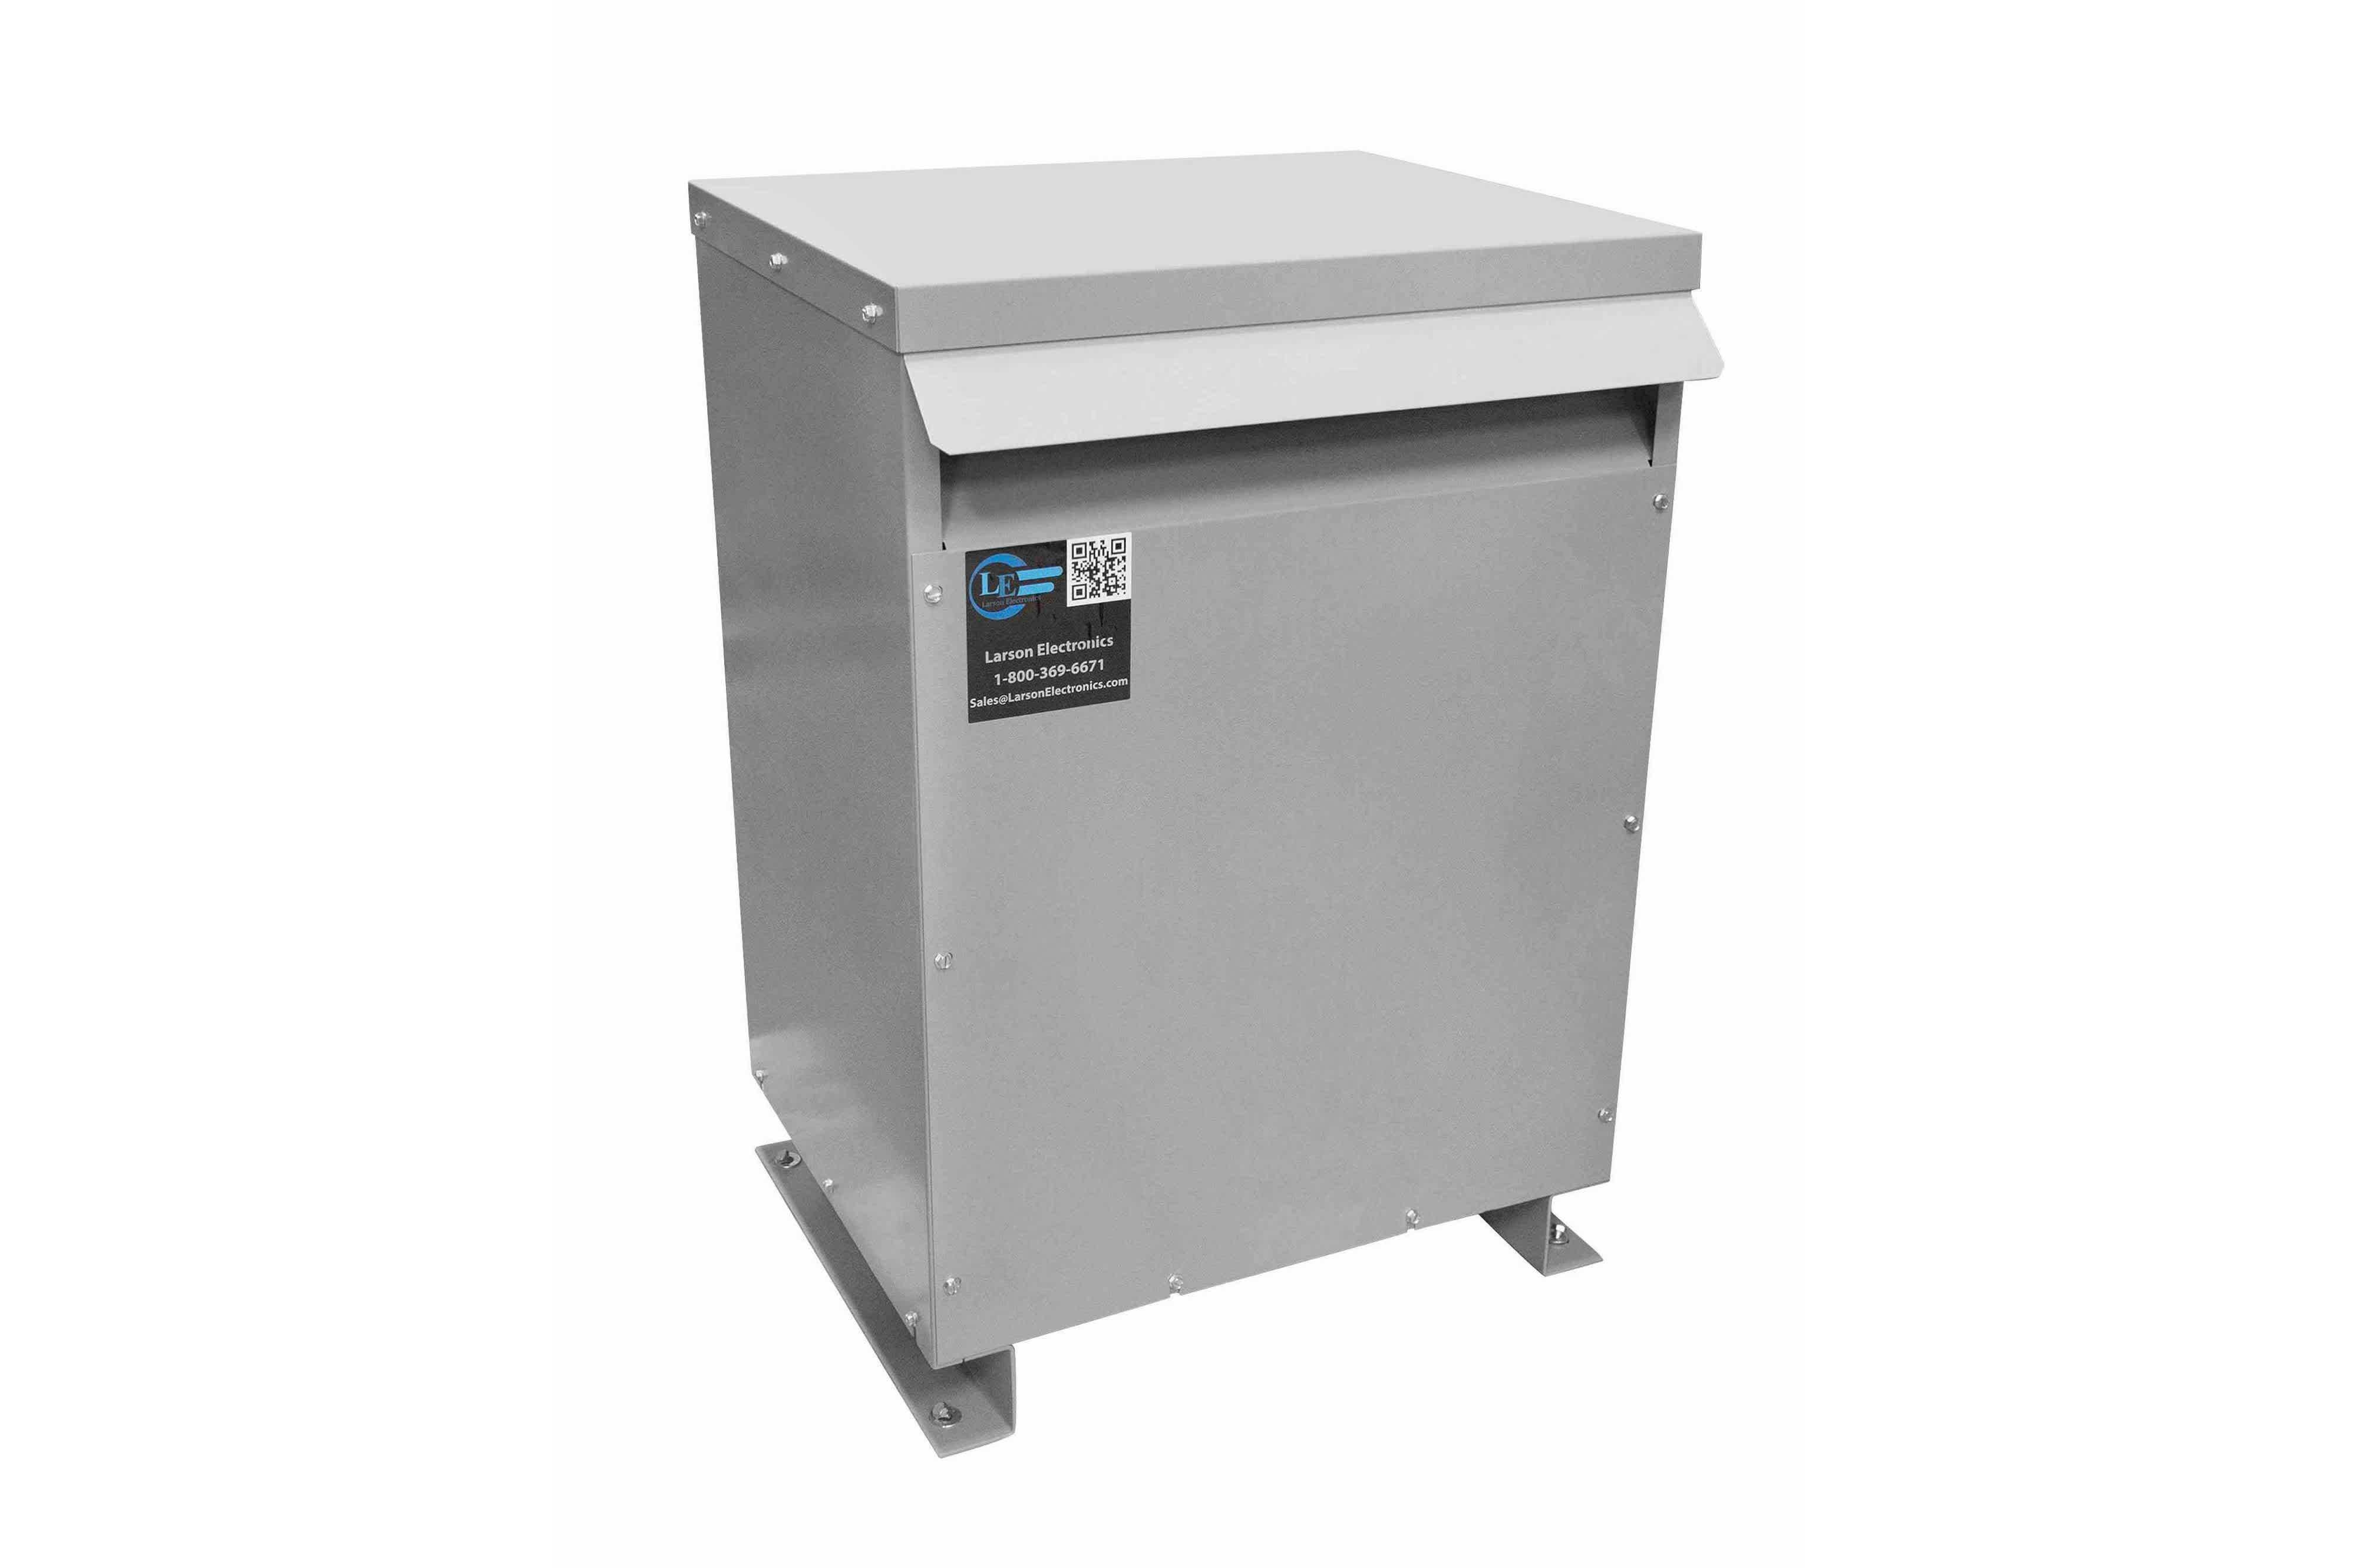 275 kVA 3PH Isolation Transformer, 415V Wye Primary, 480Y/277 Wye-N Secondary, N3R, Ventilated, 60 Hz